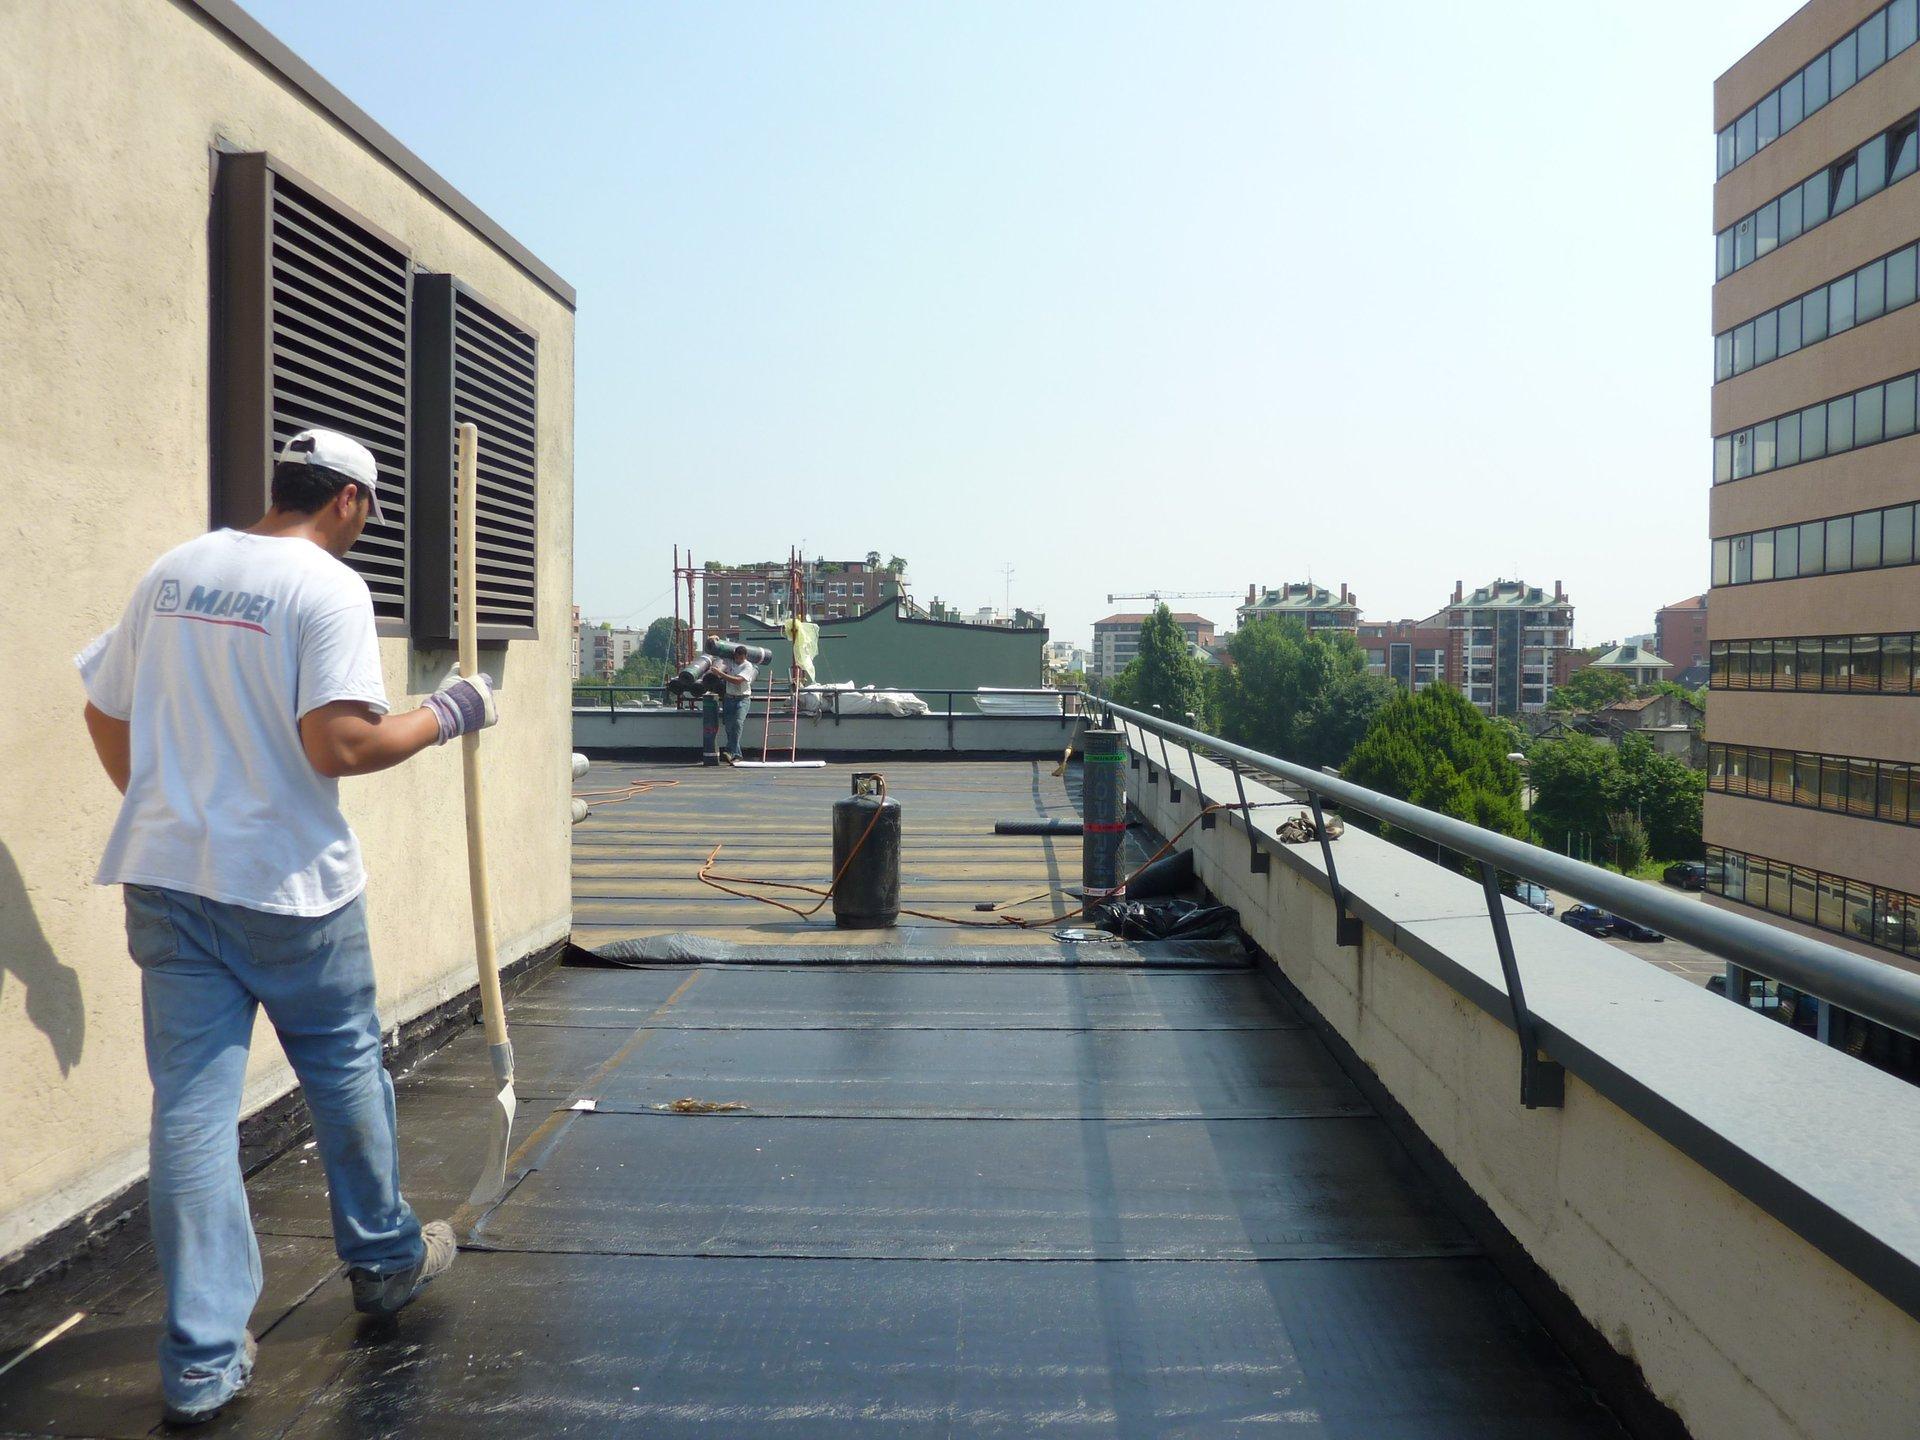 rifacimento tetto condominiale a Milano